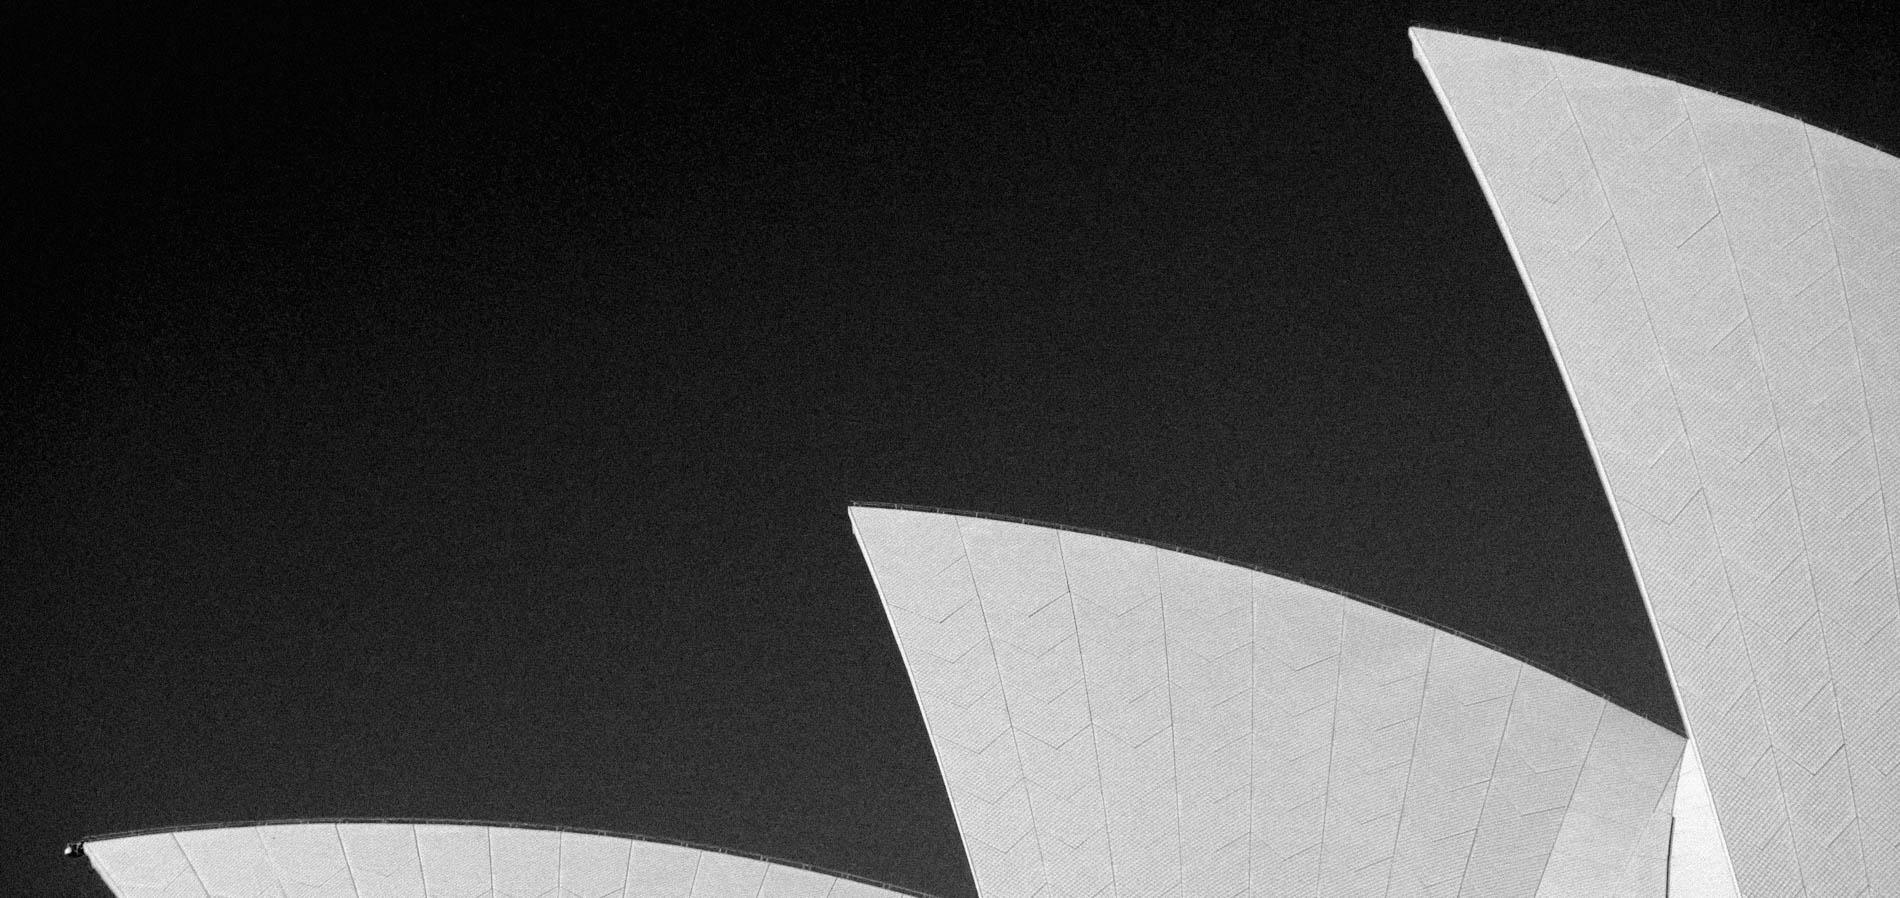 Arda, Australia, Sydney, The World, The Darkroom